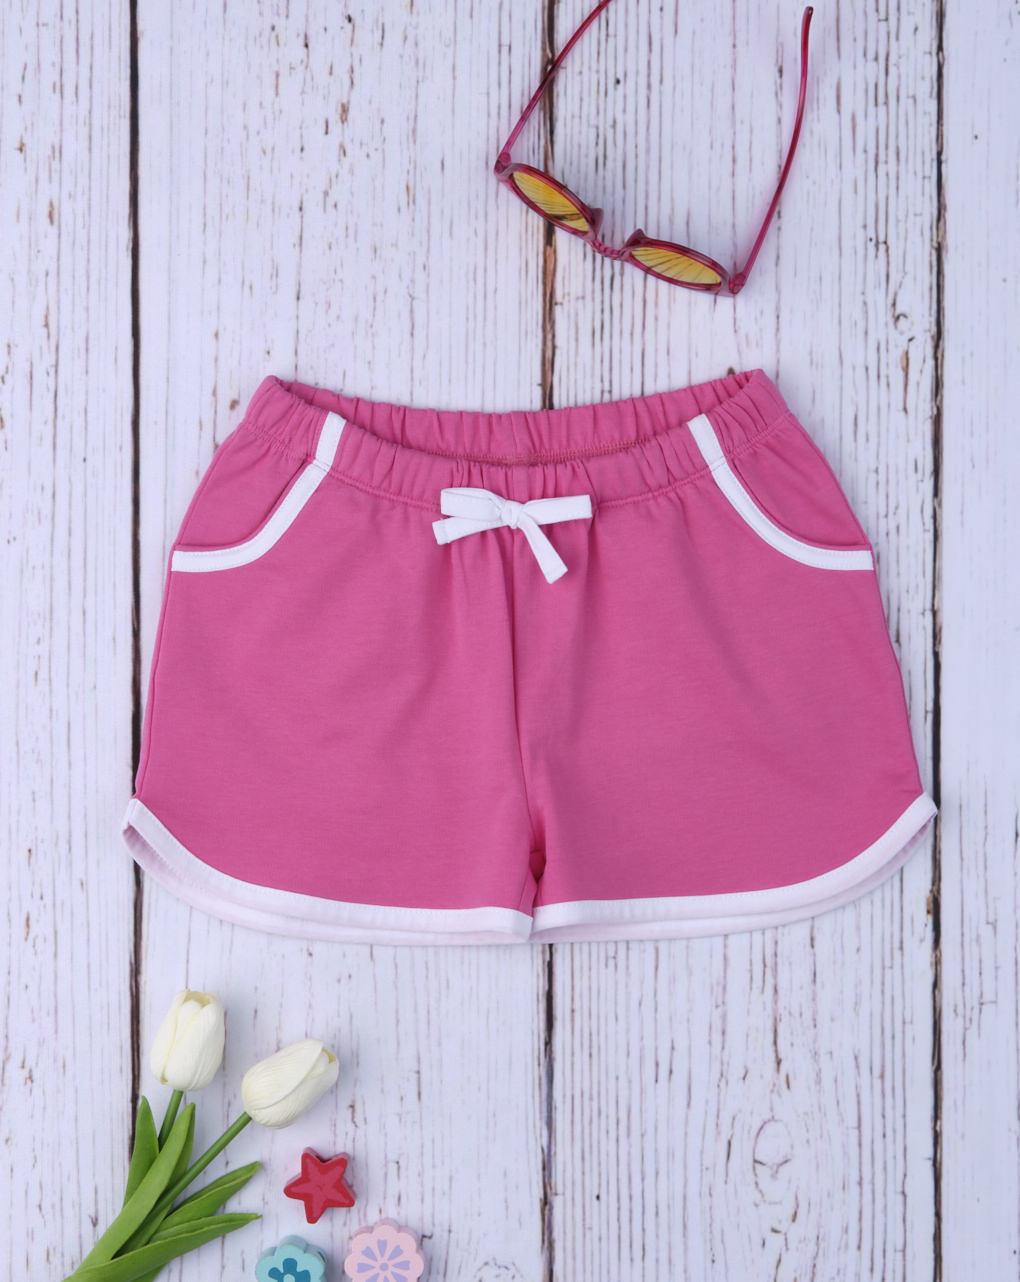 Shorts girl casual pink - Prénatal